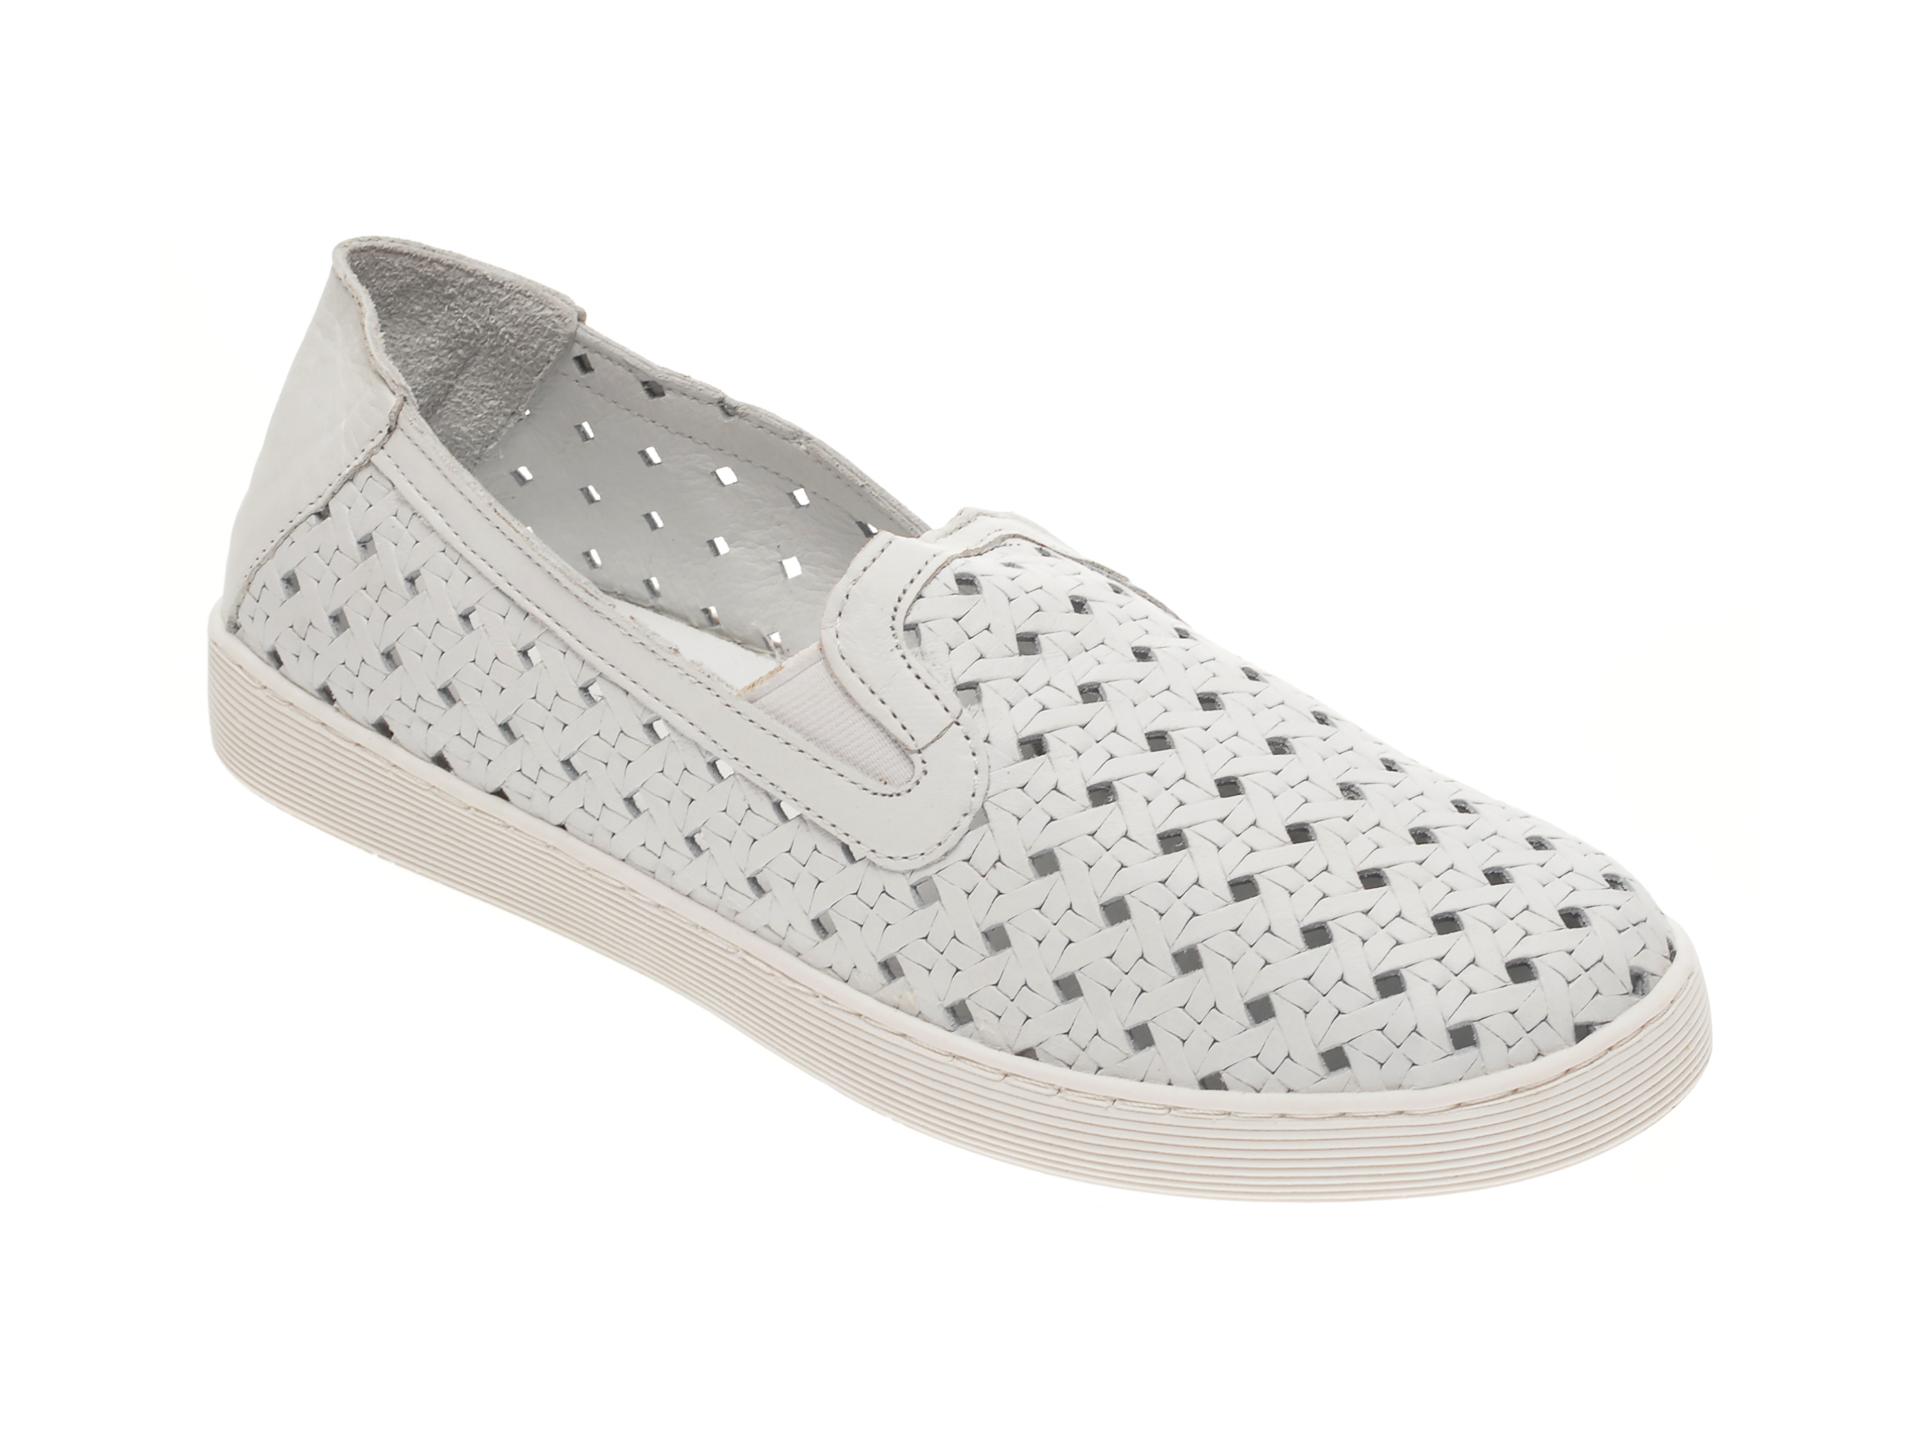 Pantofi BABOOS albi, R11, din piele naturala New